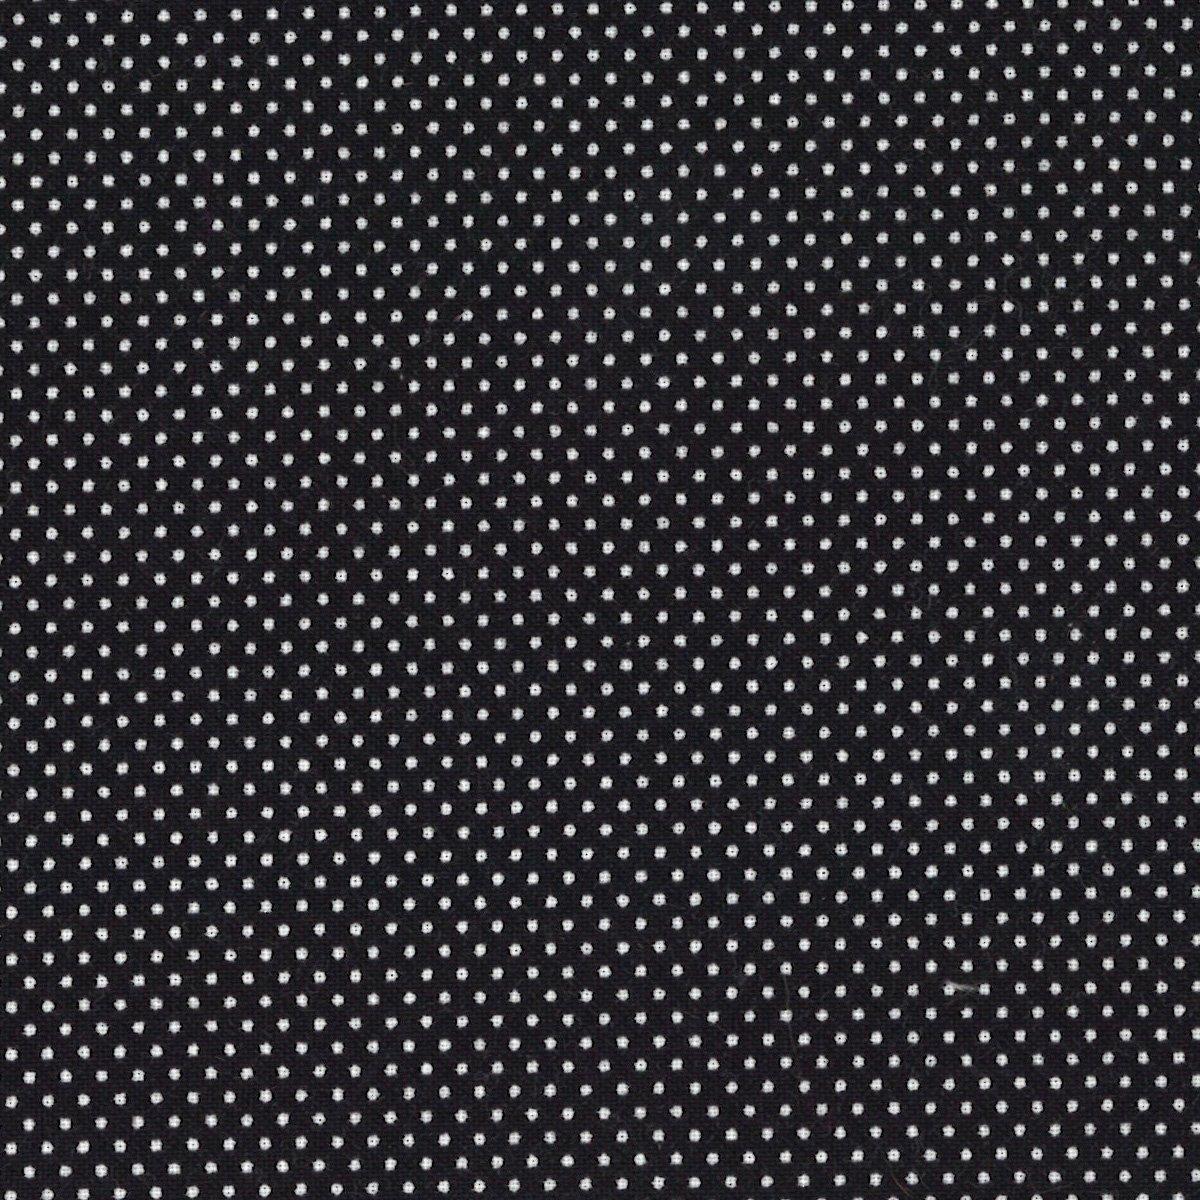 Micro Dots Blk/White